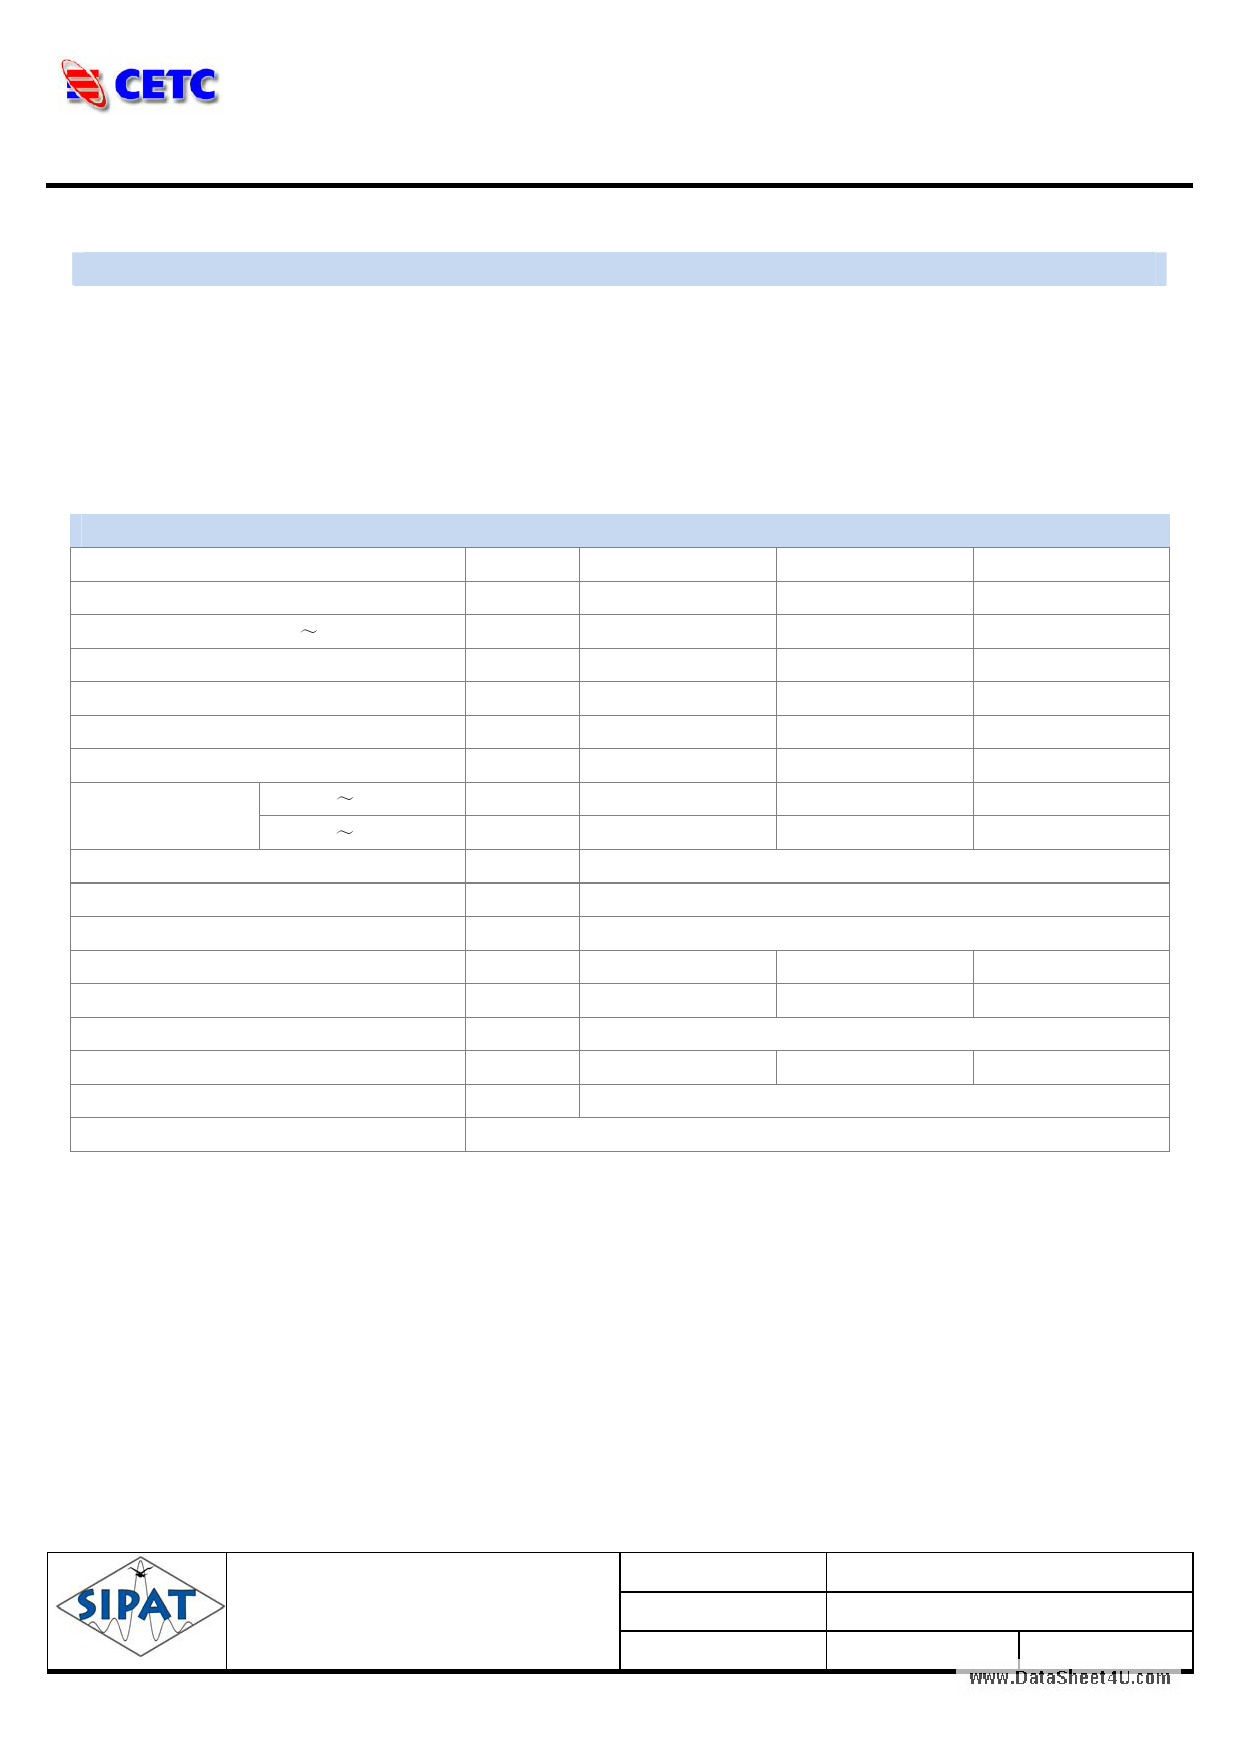 LBT90501 datasheet